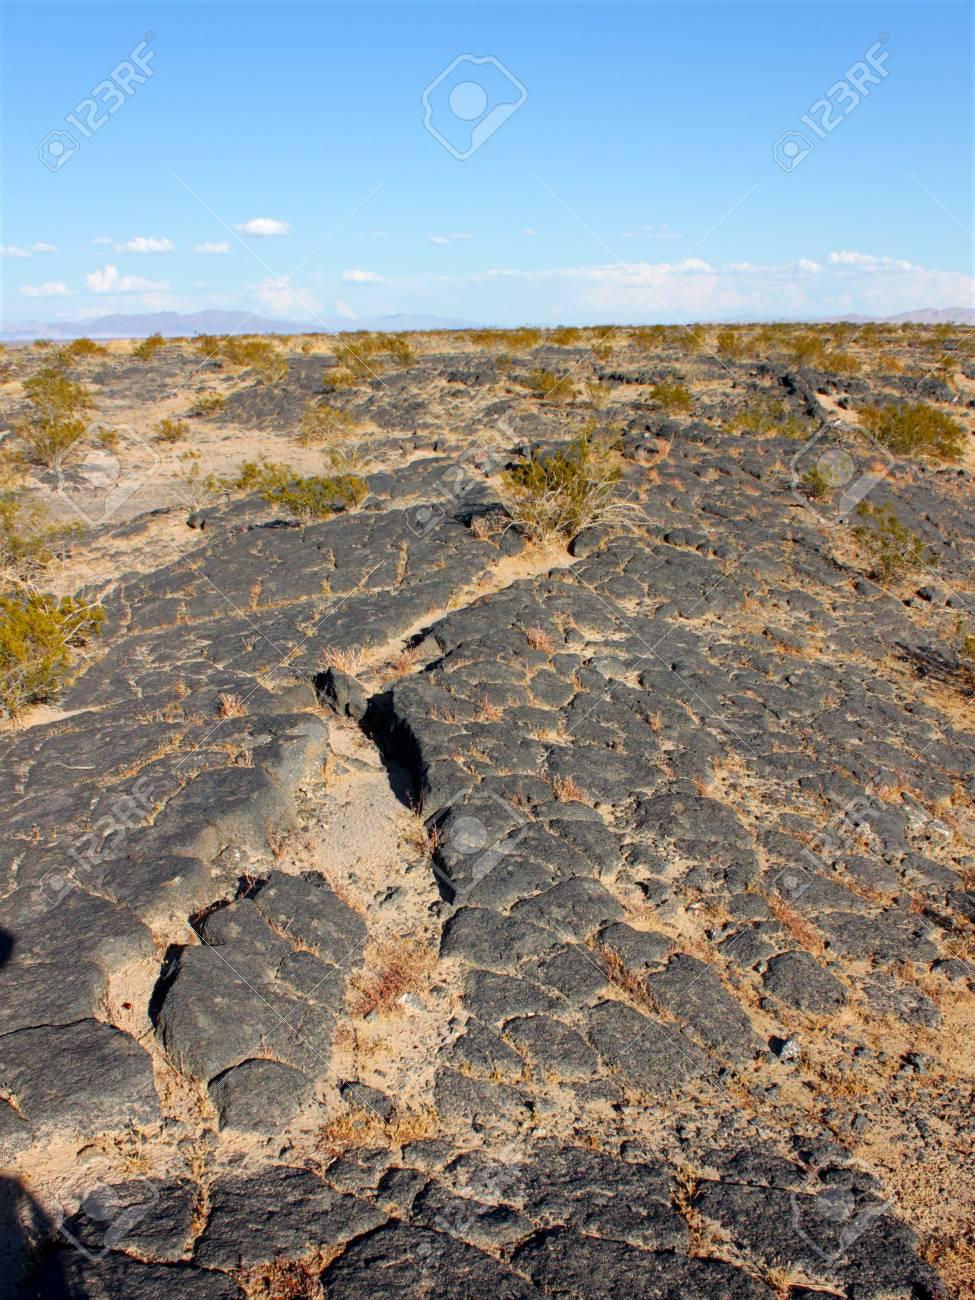 Volcanic rock scatters the desert around Amboy Crater National Natural Landmark in California Stock Photo - 9896719